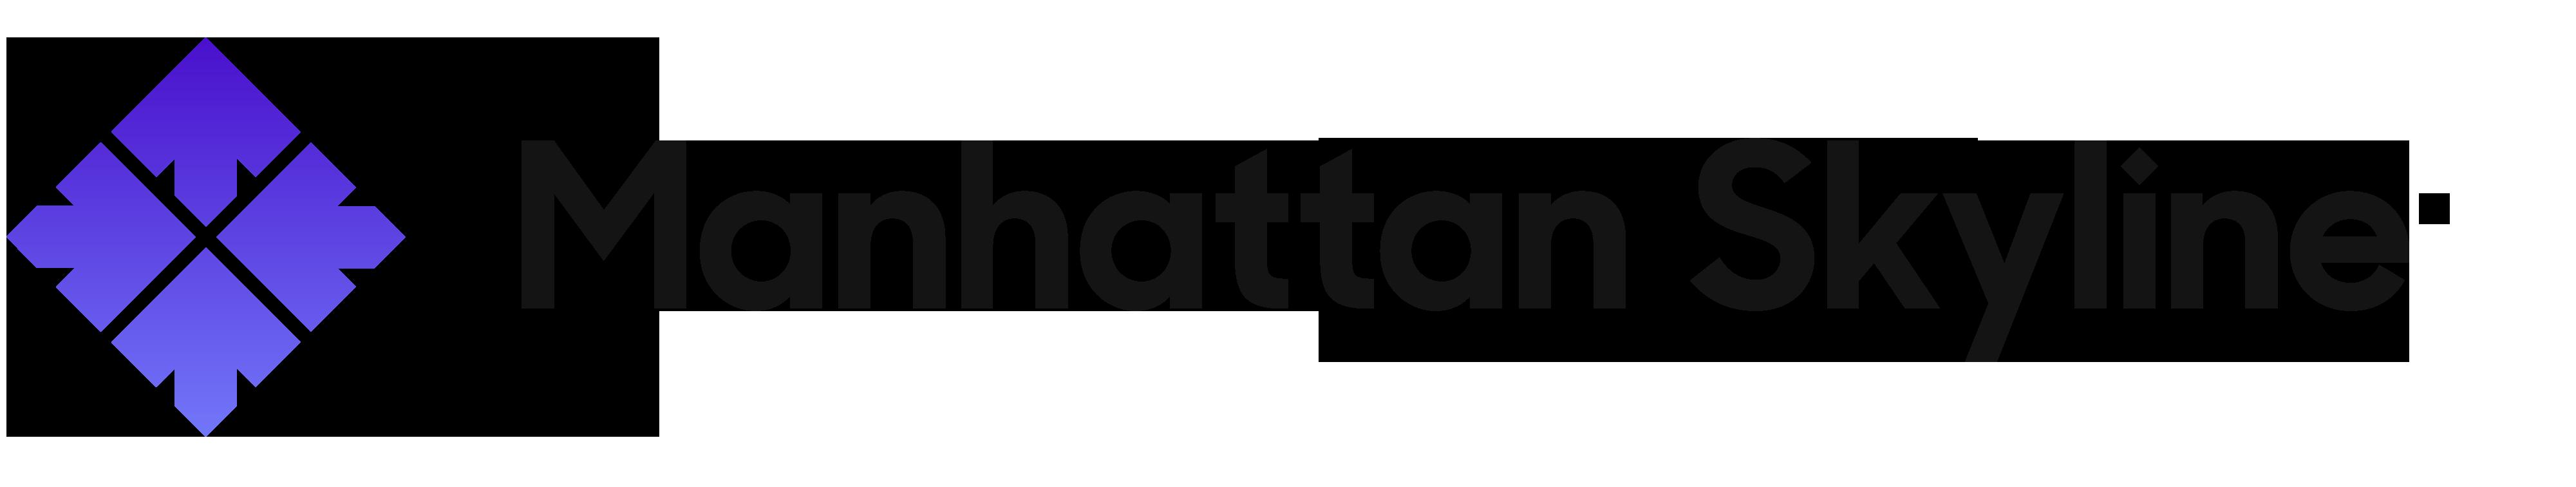 Manhattan Skyline Logo Black